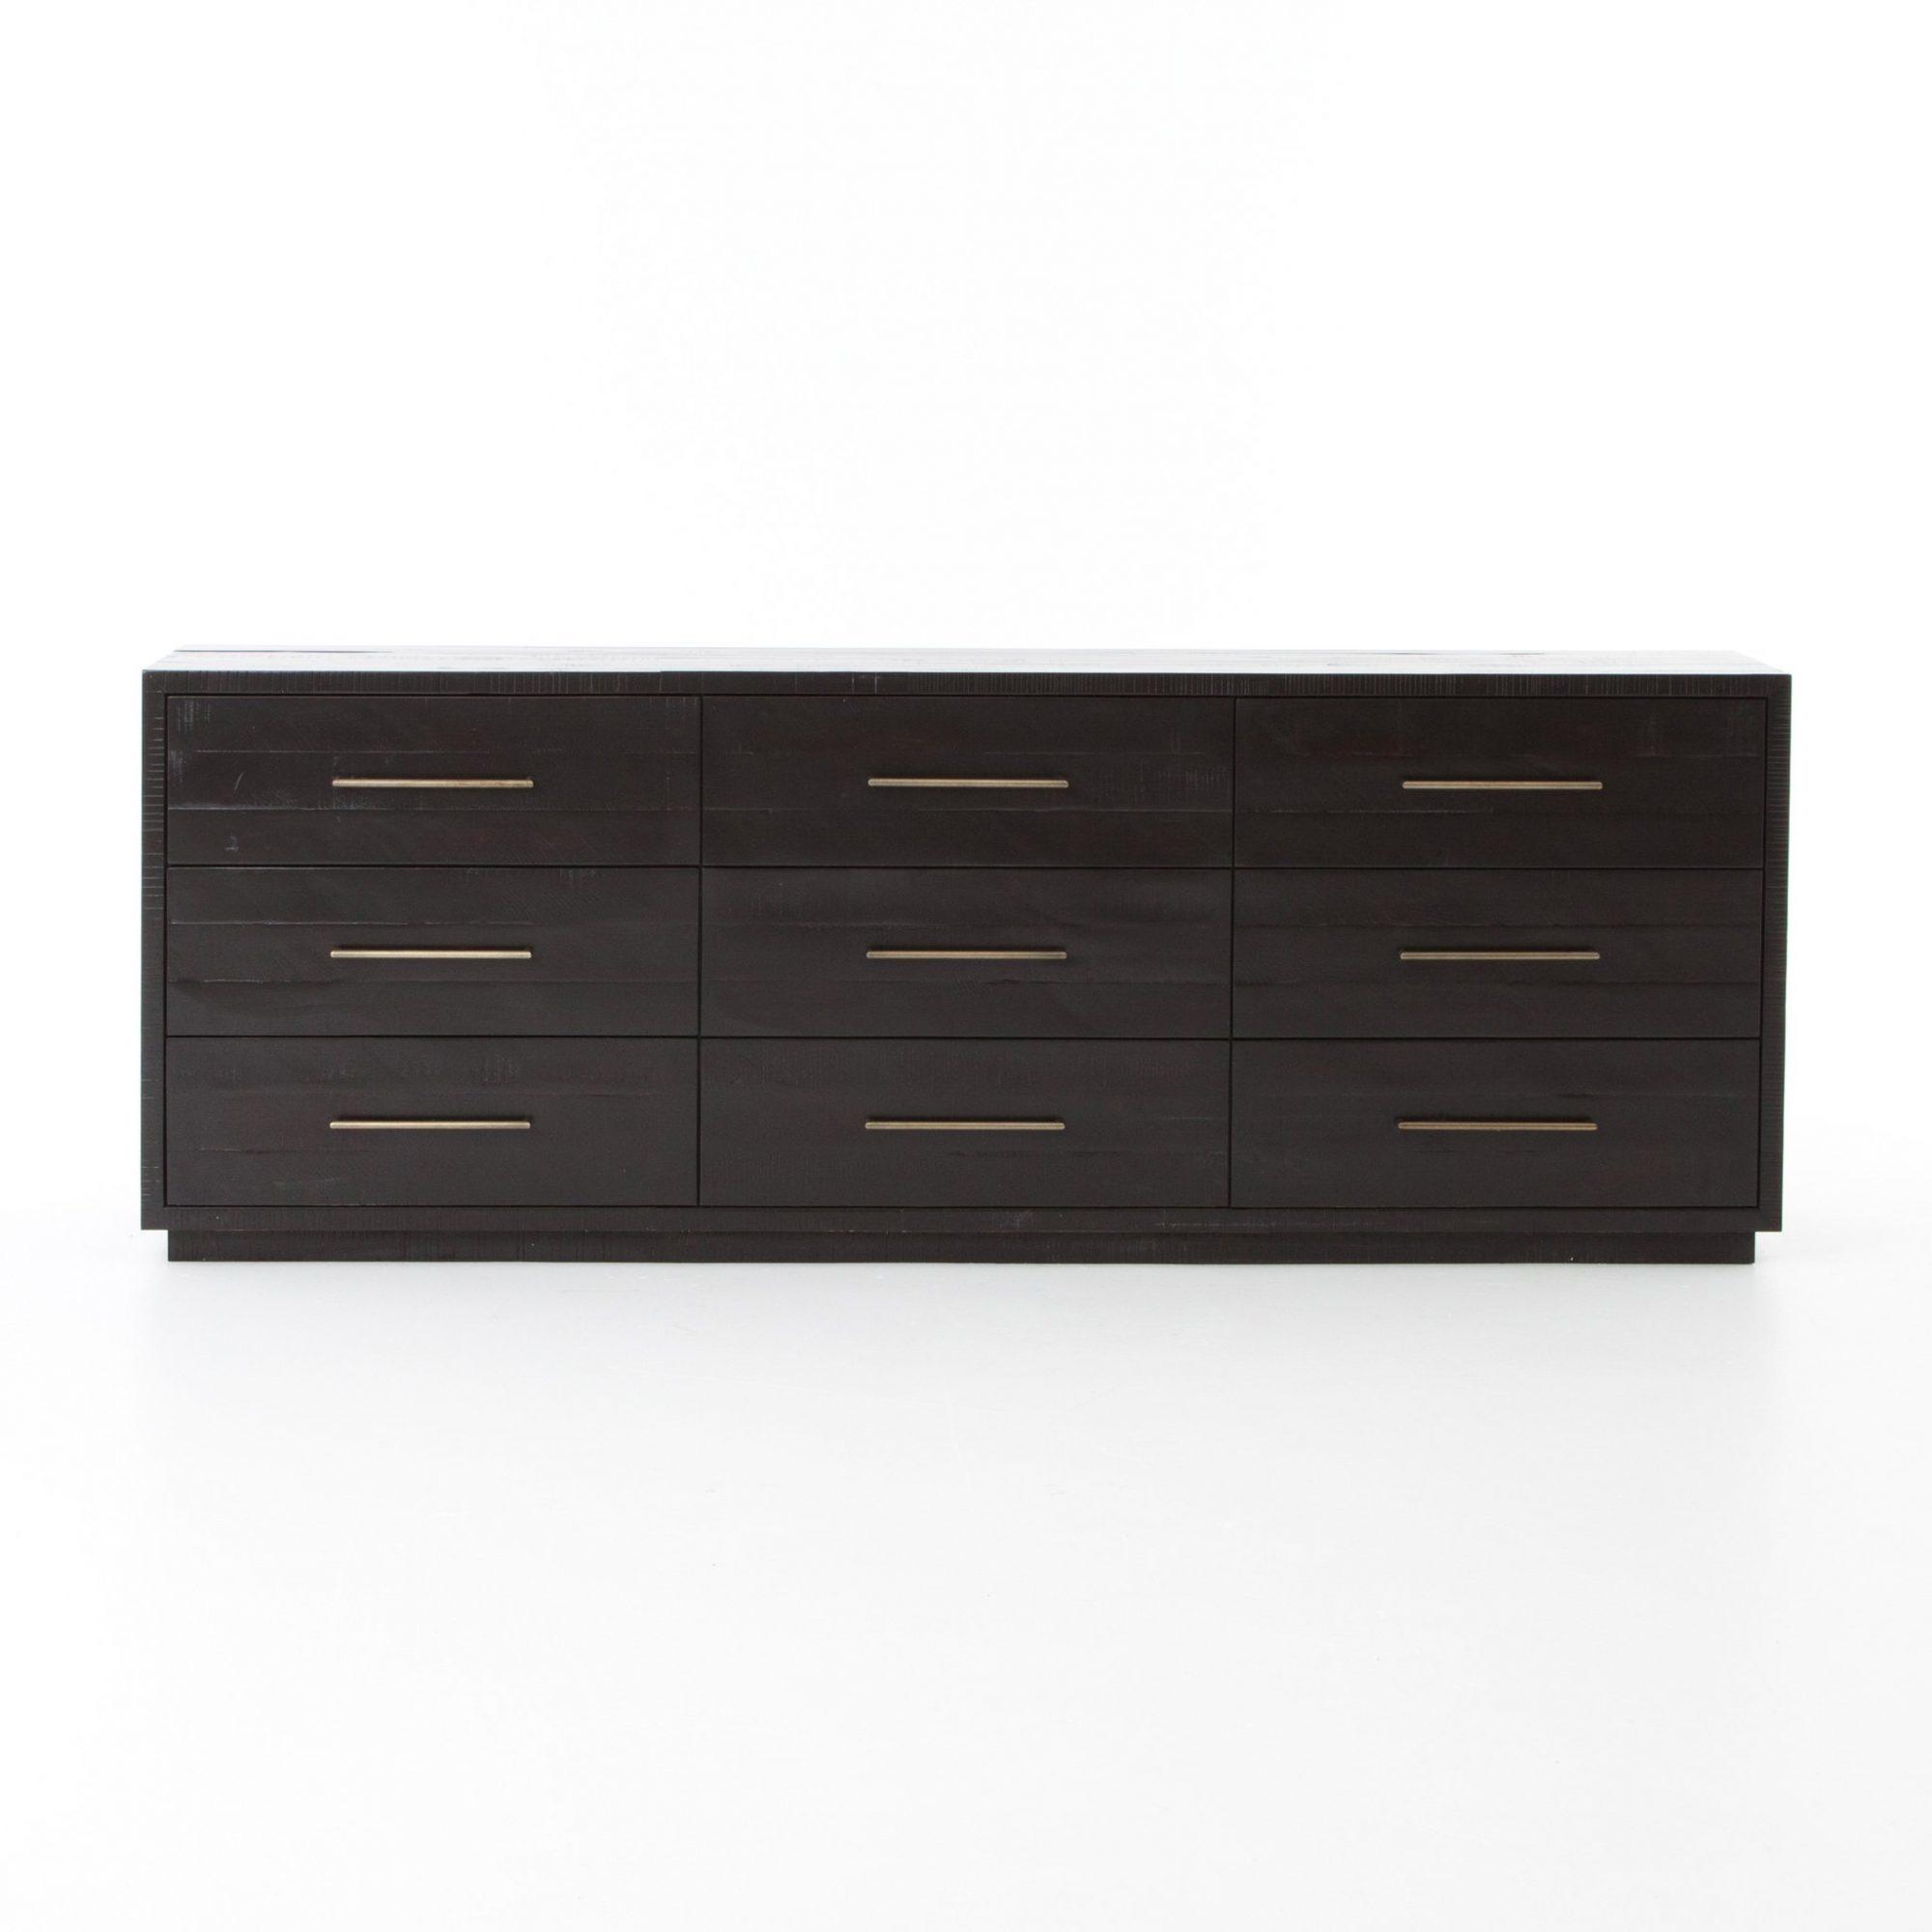 Suki 9 Drawer Dresser in Burnished Black